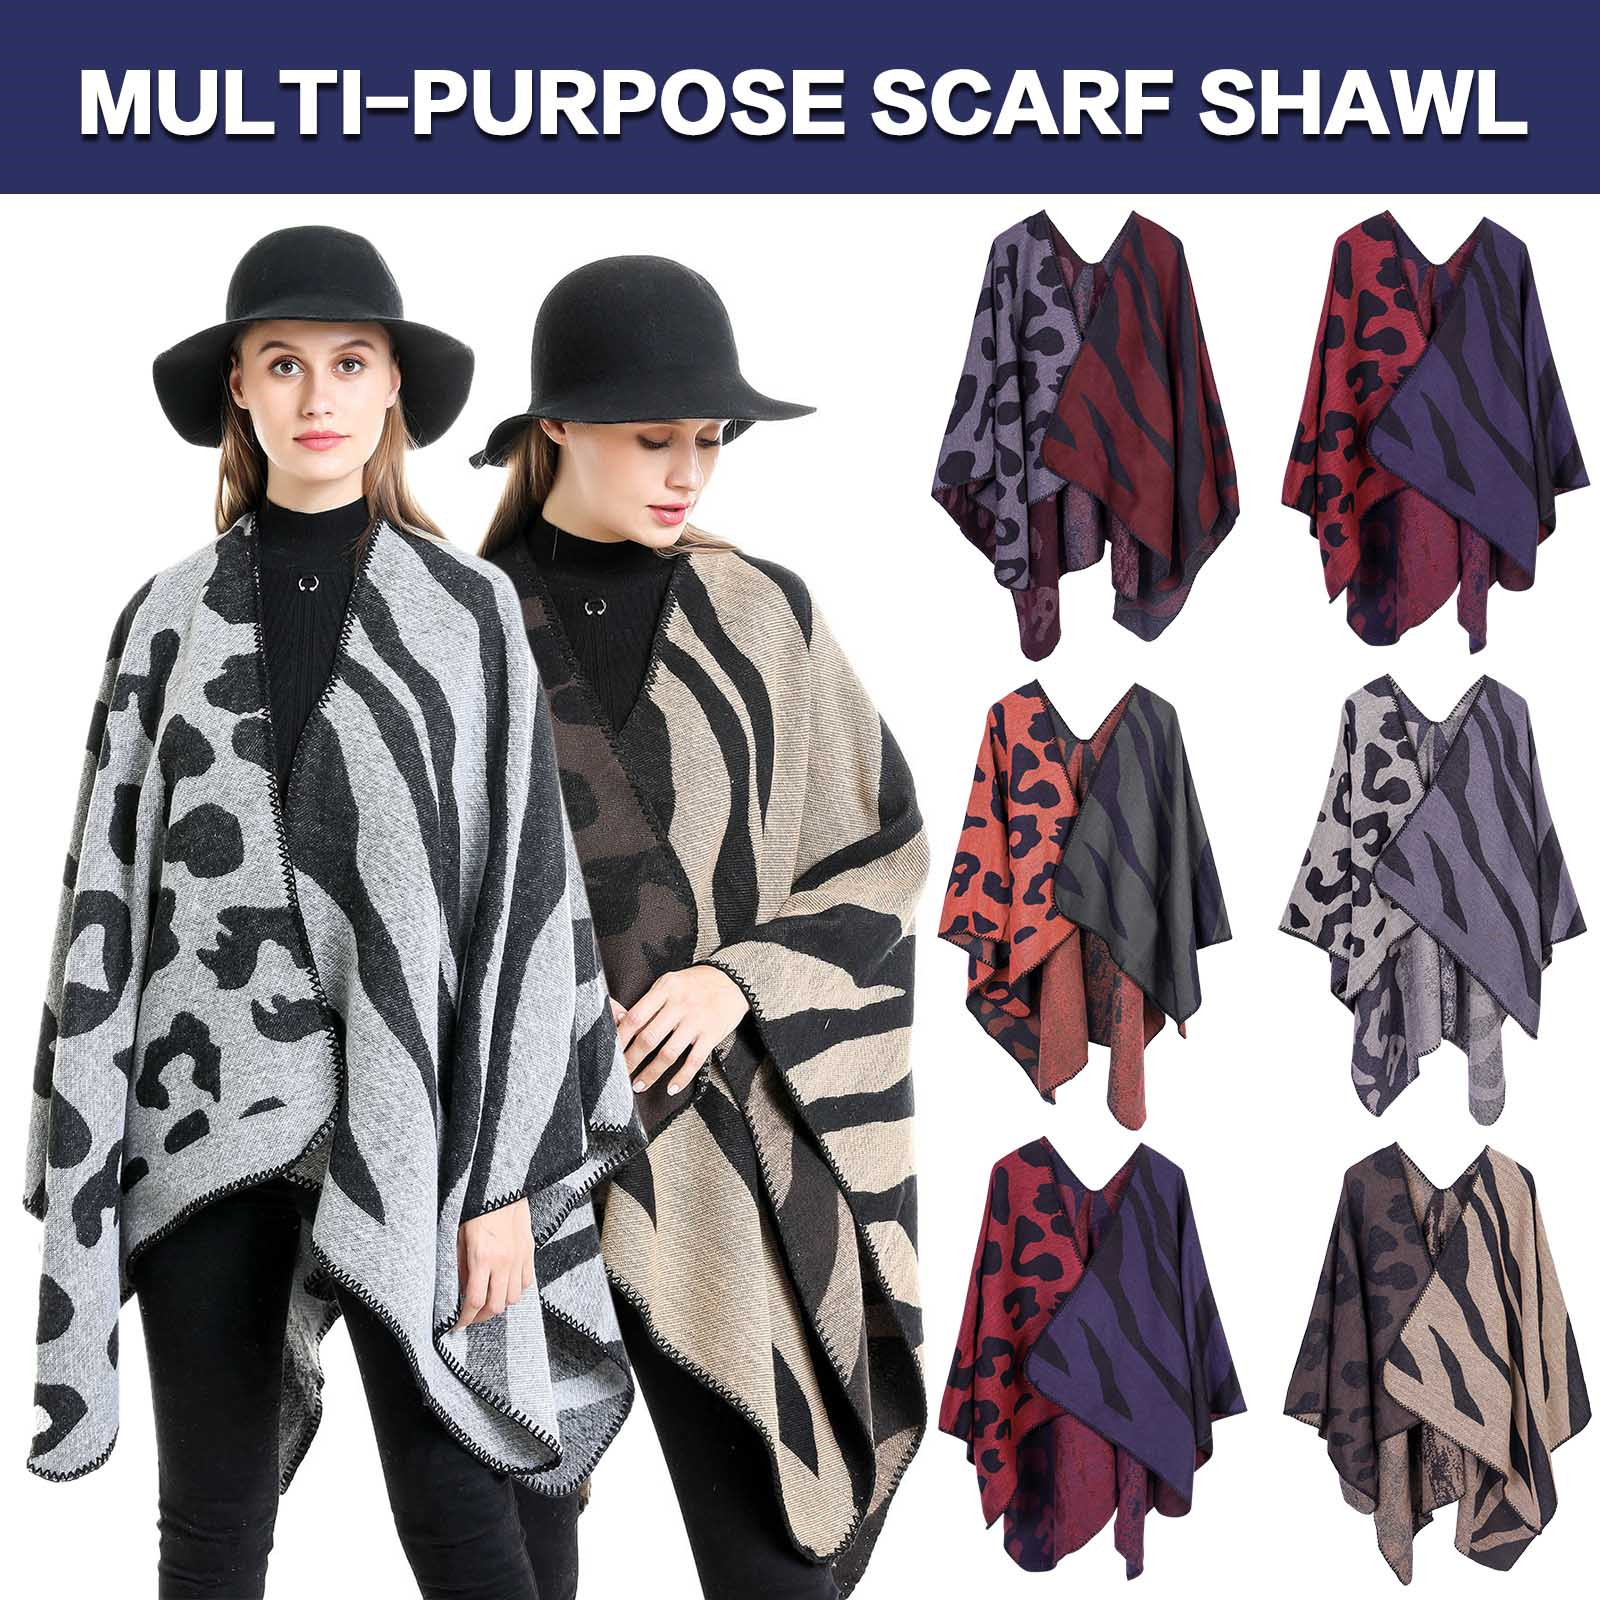 2020 Patchwork Scarf For Women Warmer Winter Pashmina Scarf Shawls Female Blanket Wraps Echarpe Foulard Femme New Arrival